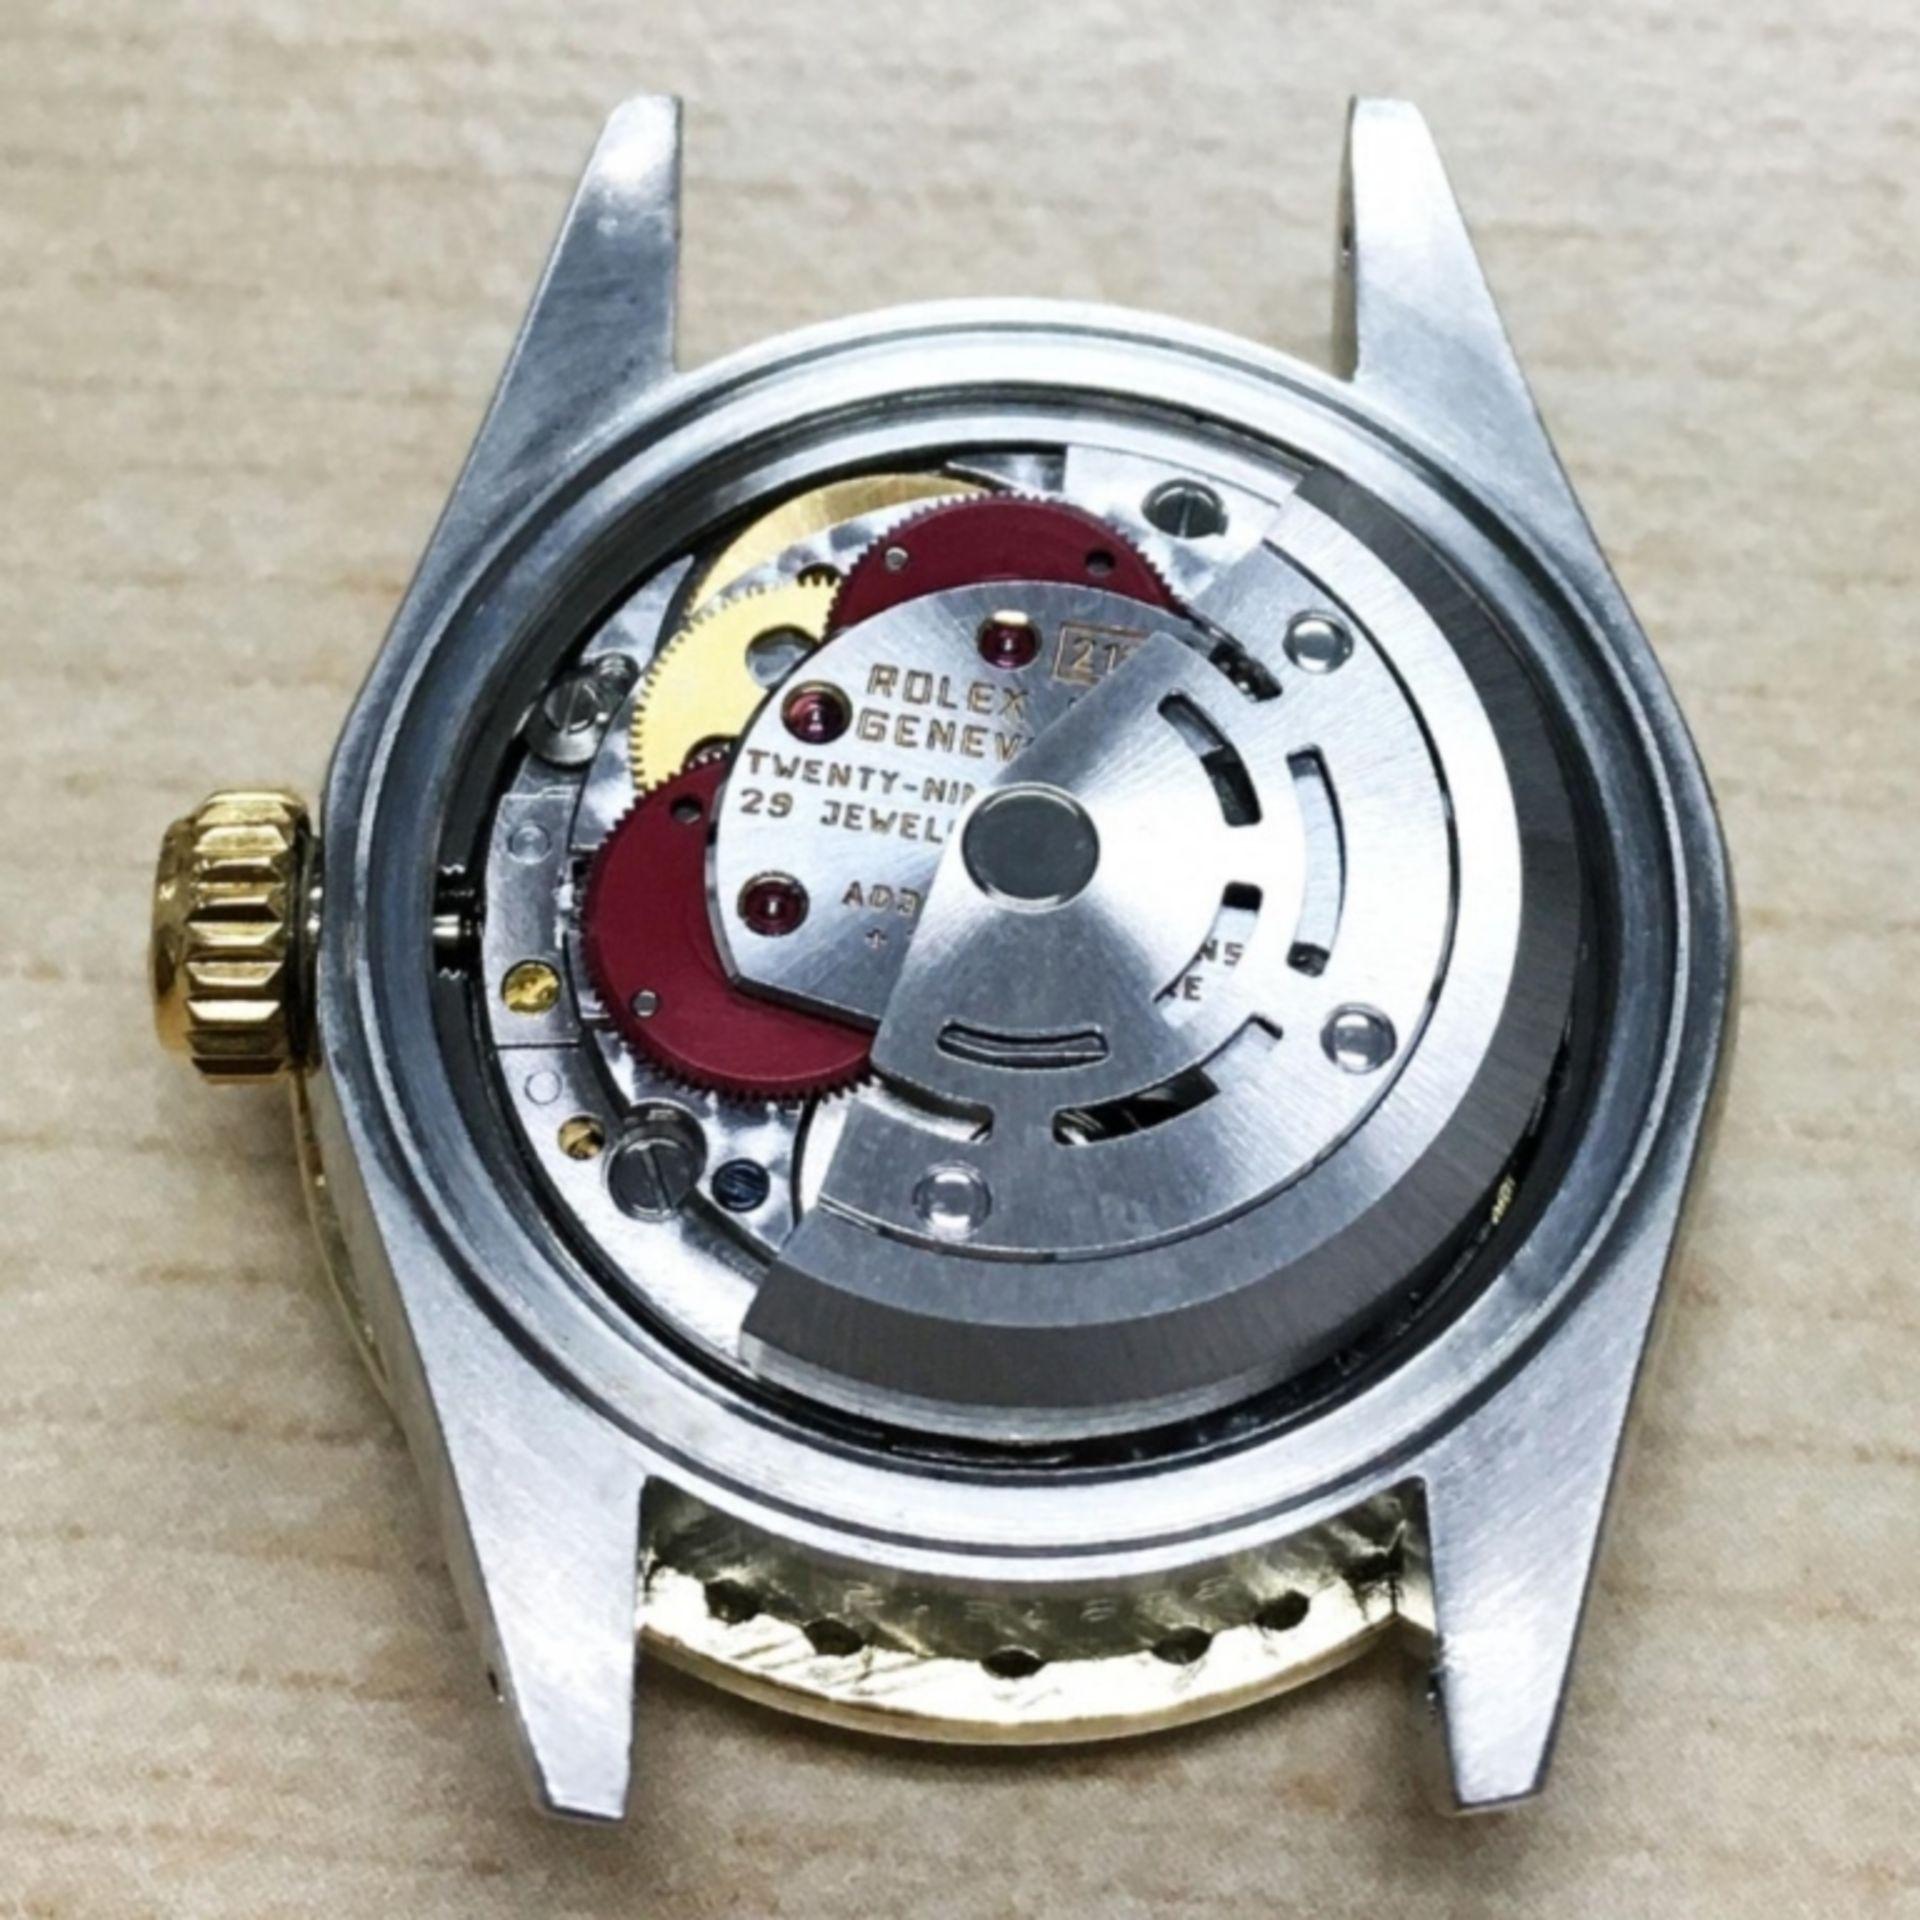 Rolex DateJust 18K & SS 1.00ct Diamond Blue Vignet - Image 3 of 8